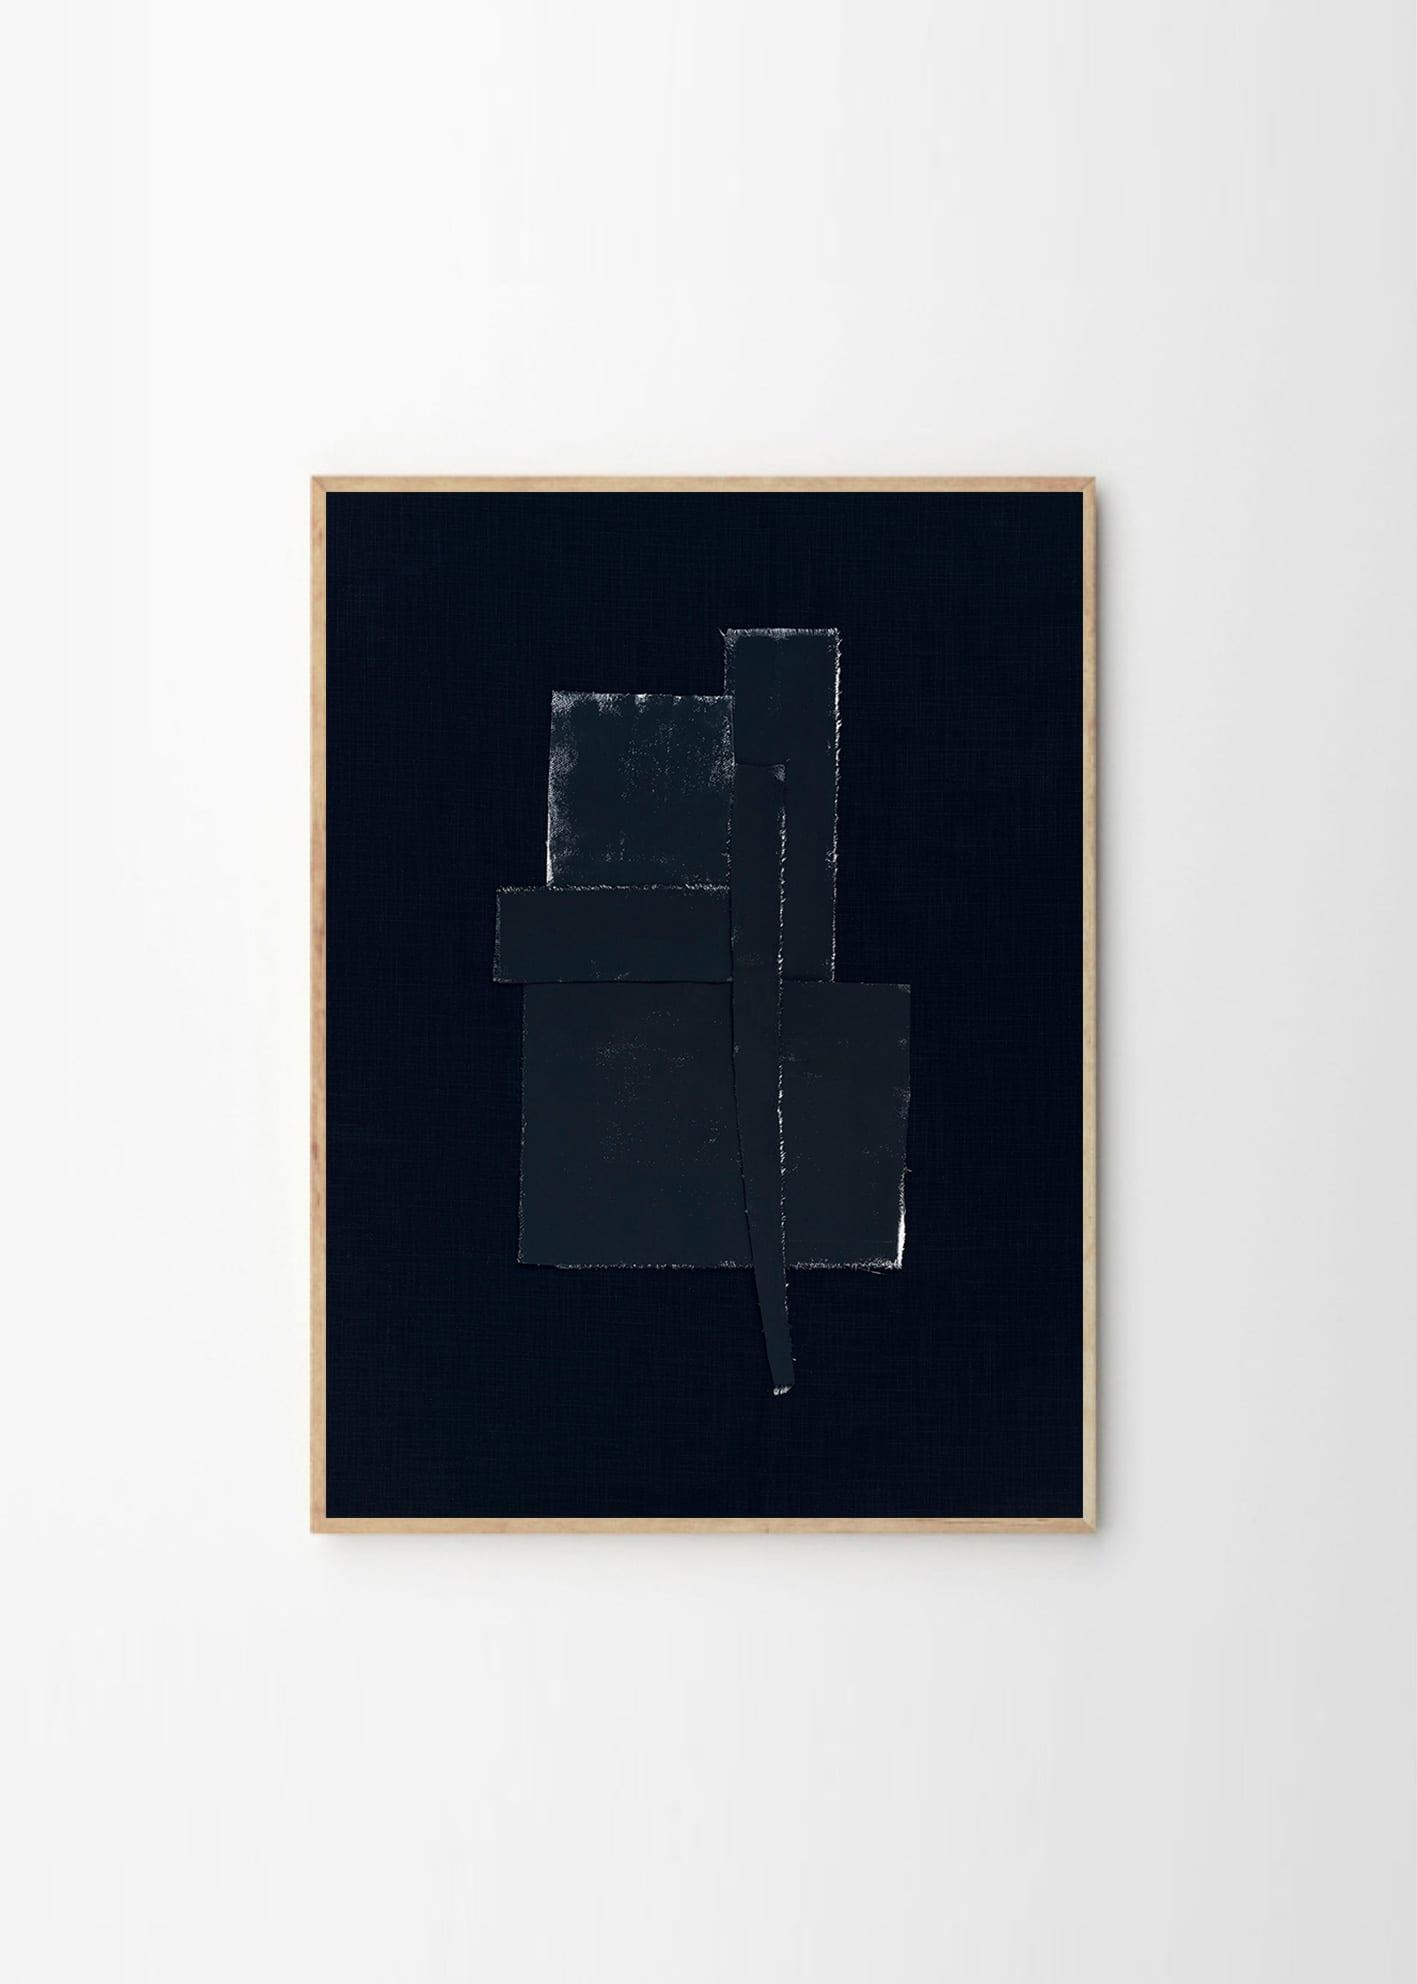 Atelier Cph - 01